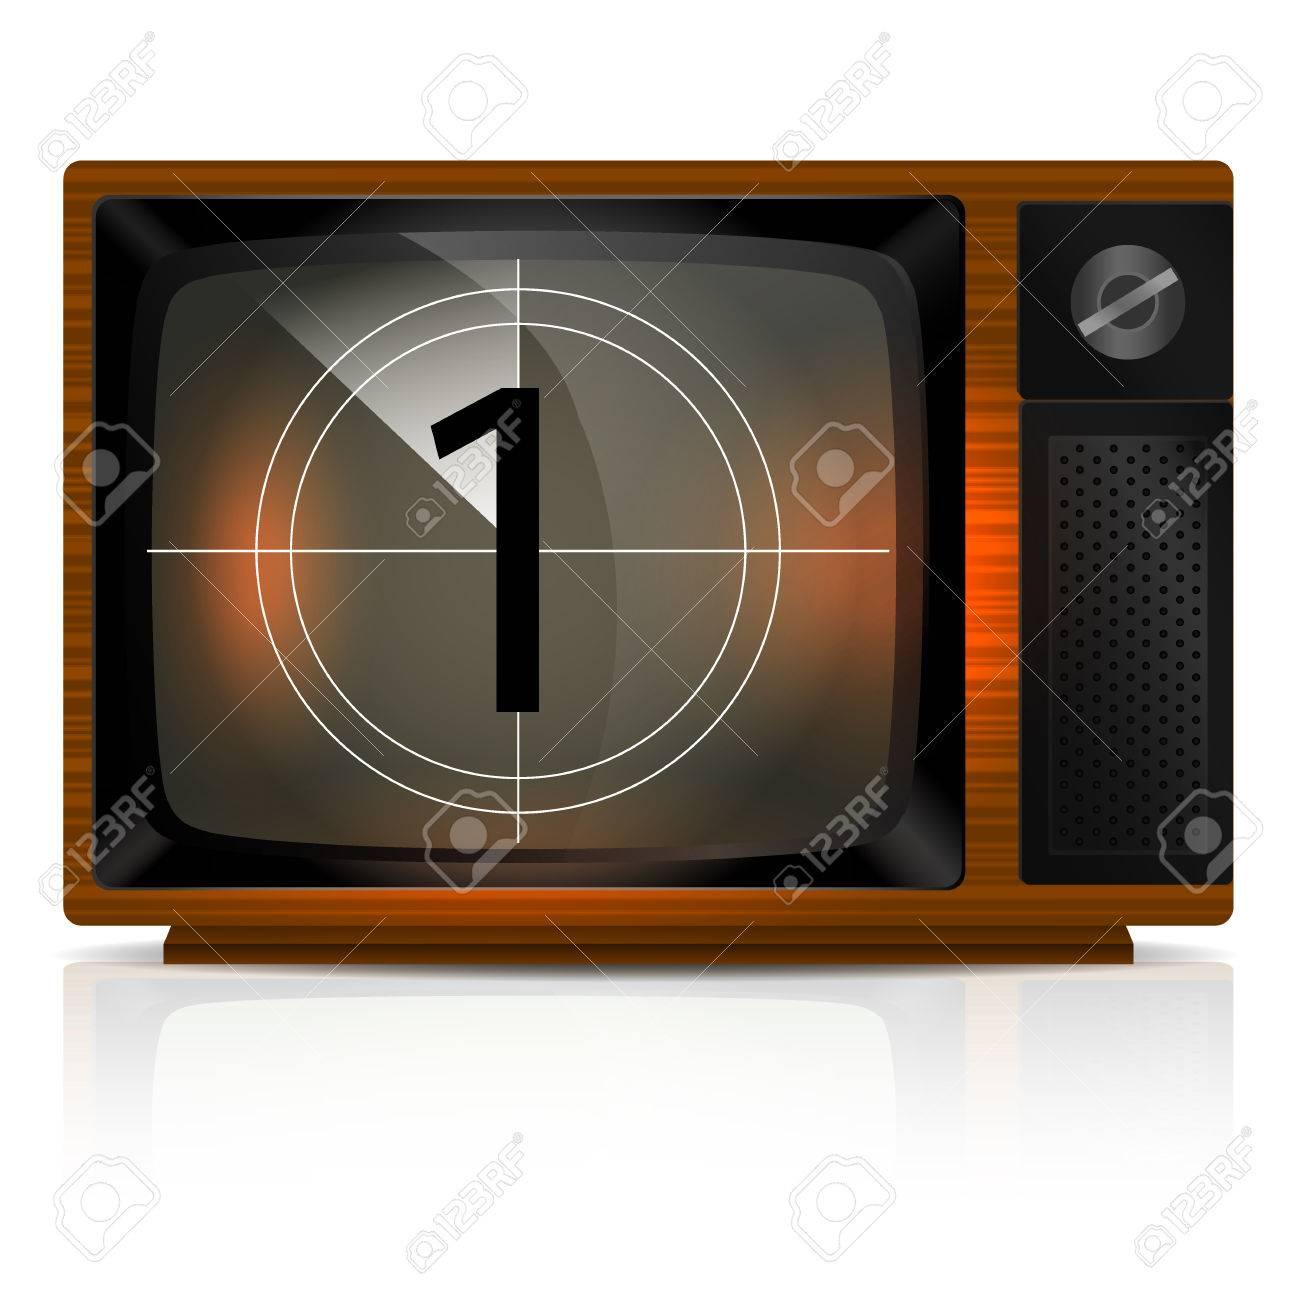 Countdown 1 on the Retro TV